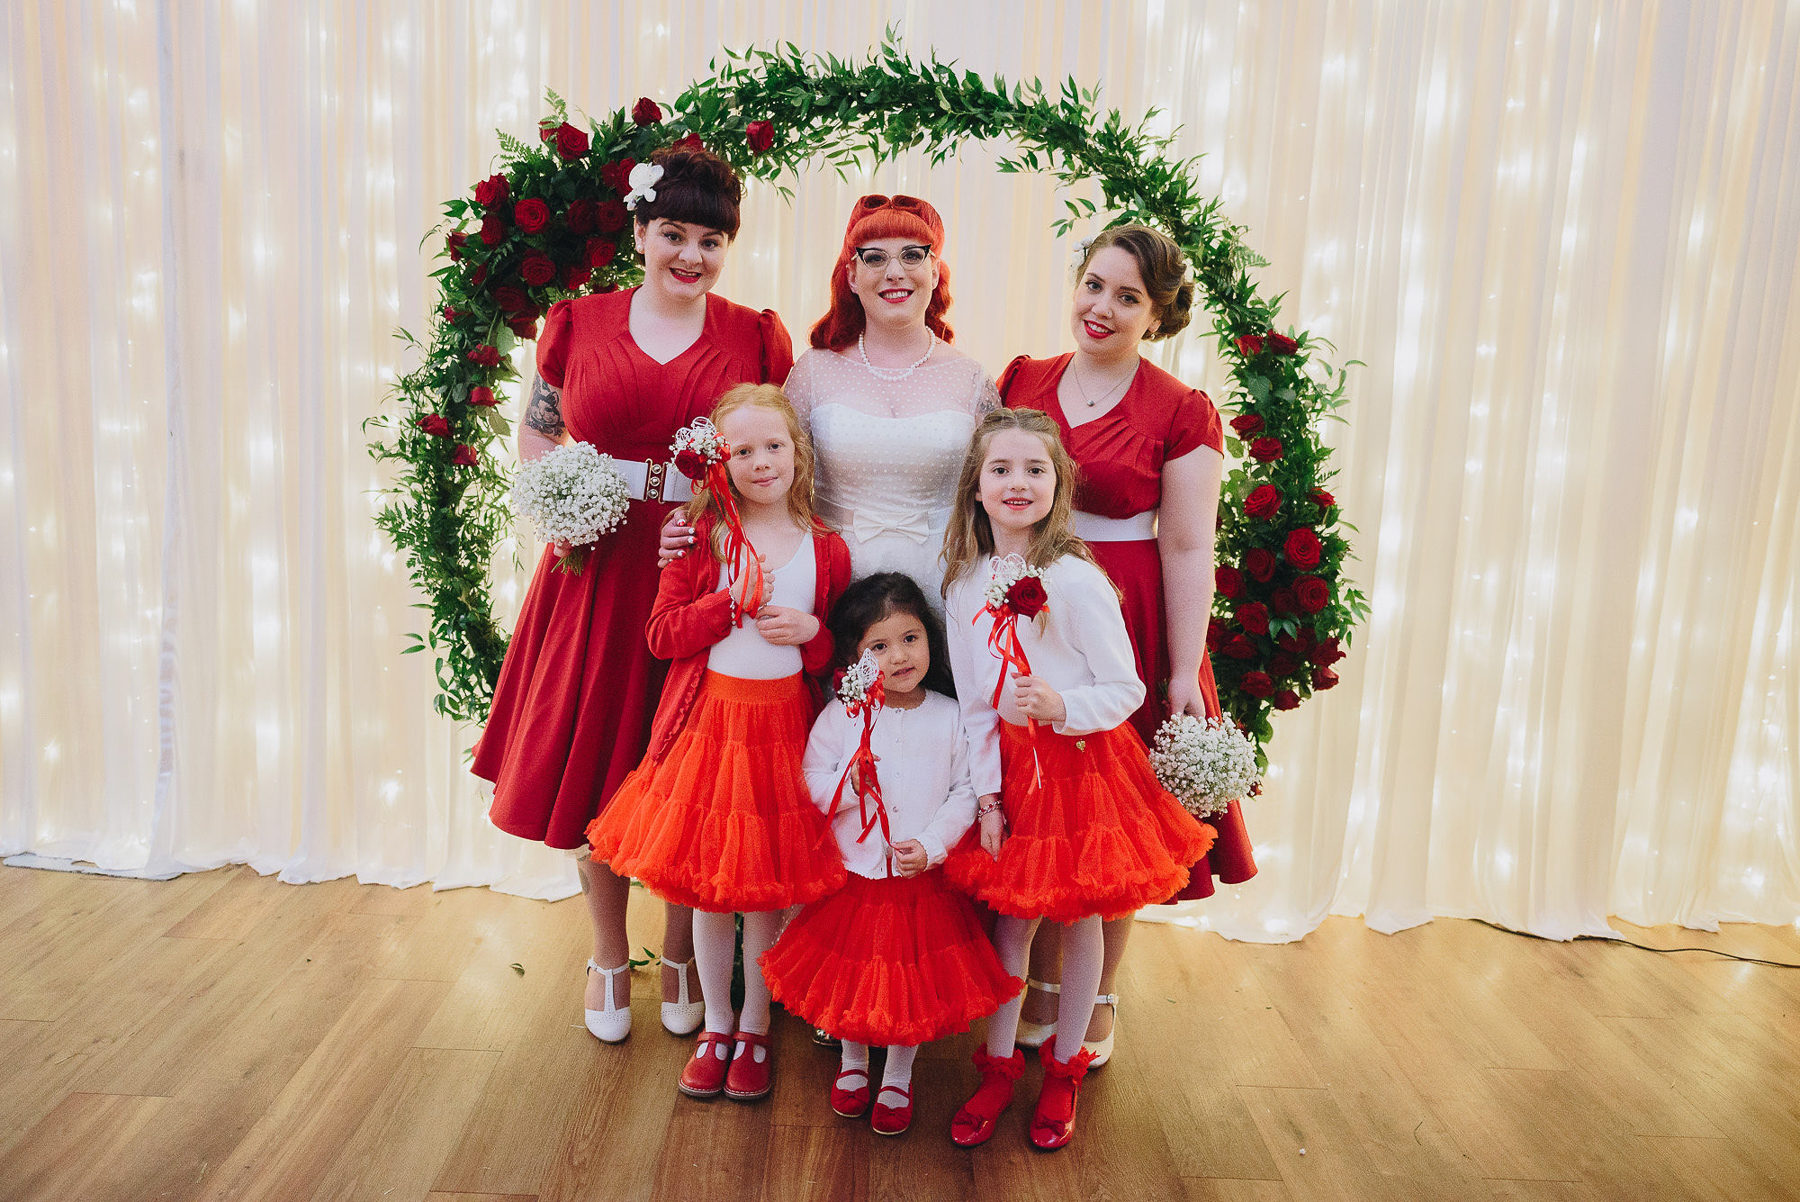 Wellbeing_Farm_Wedding_Photography_The_Pin-Up_Bride_Lara_Shaun-105.jpg